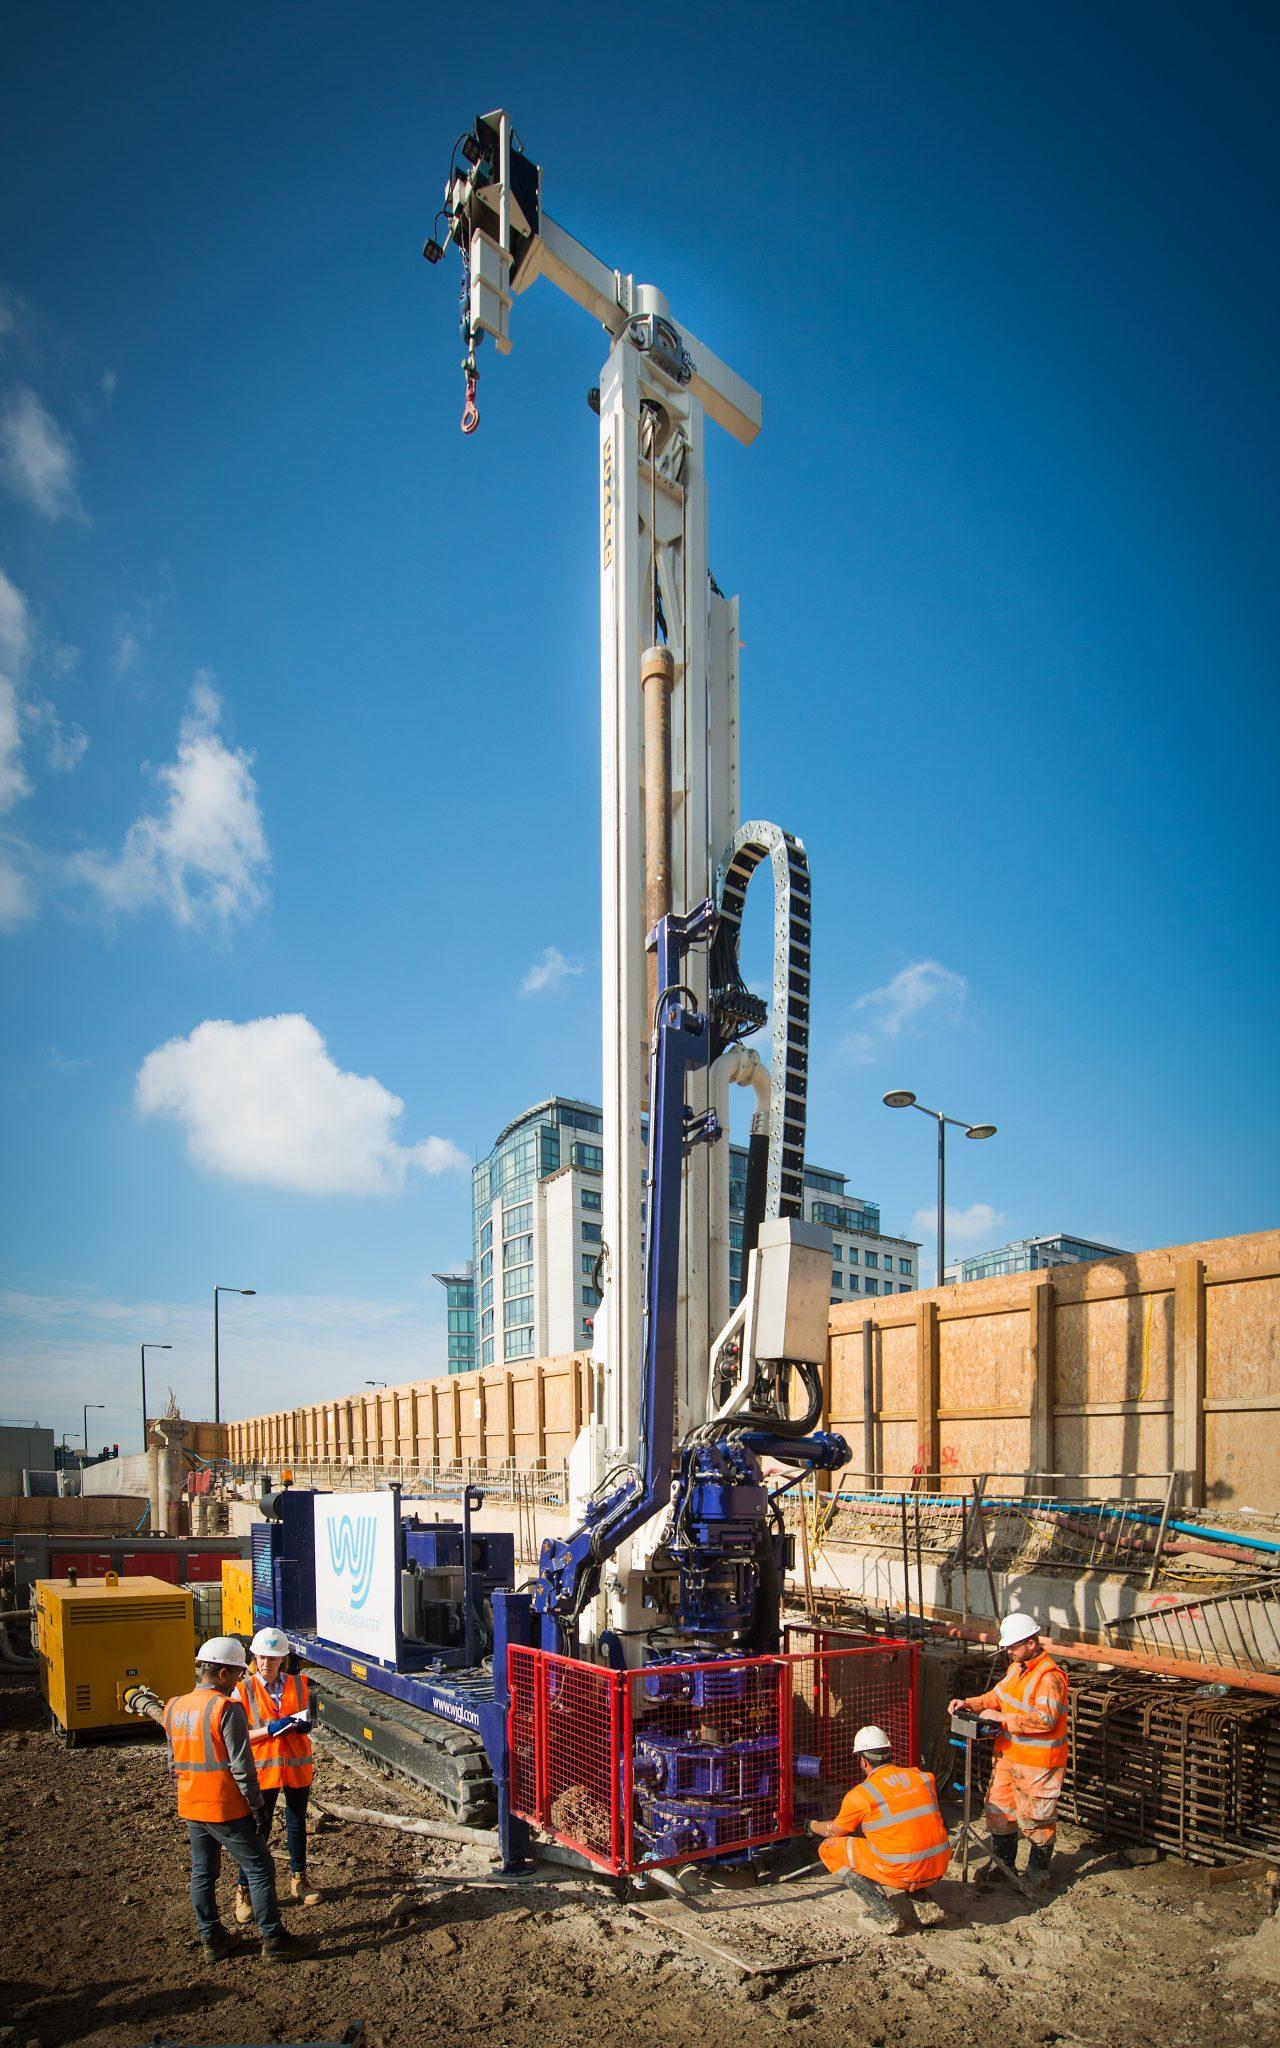 wj-groundwater_brunel-building_paddington-basin-london_silver-cloud-photography_0005